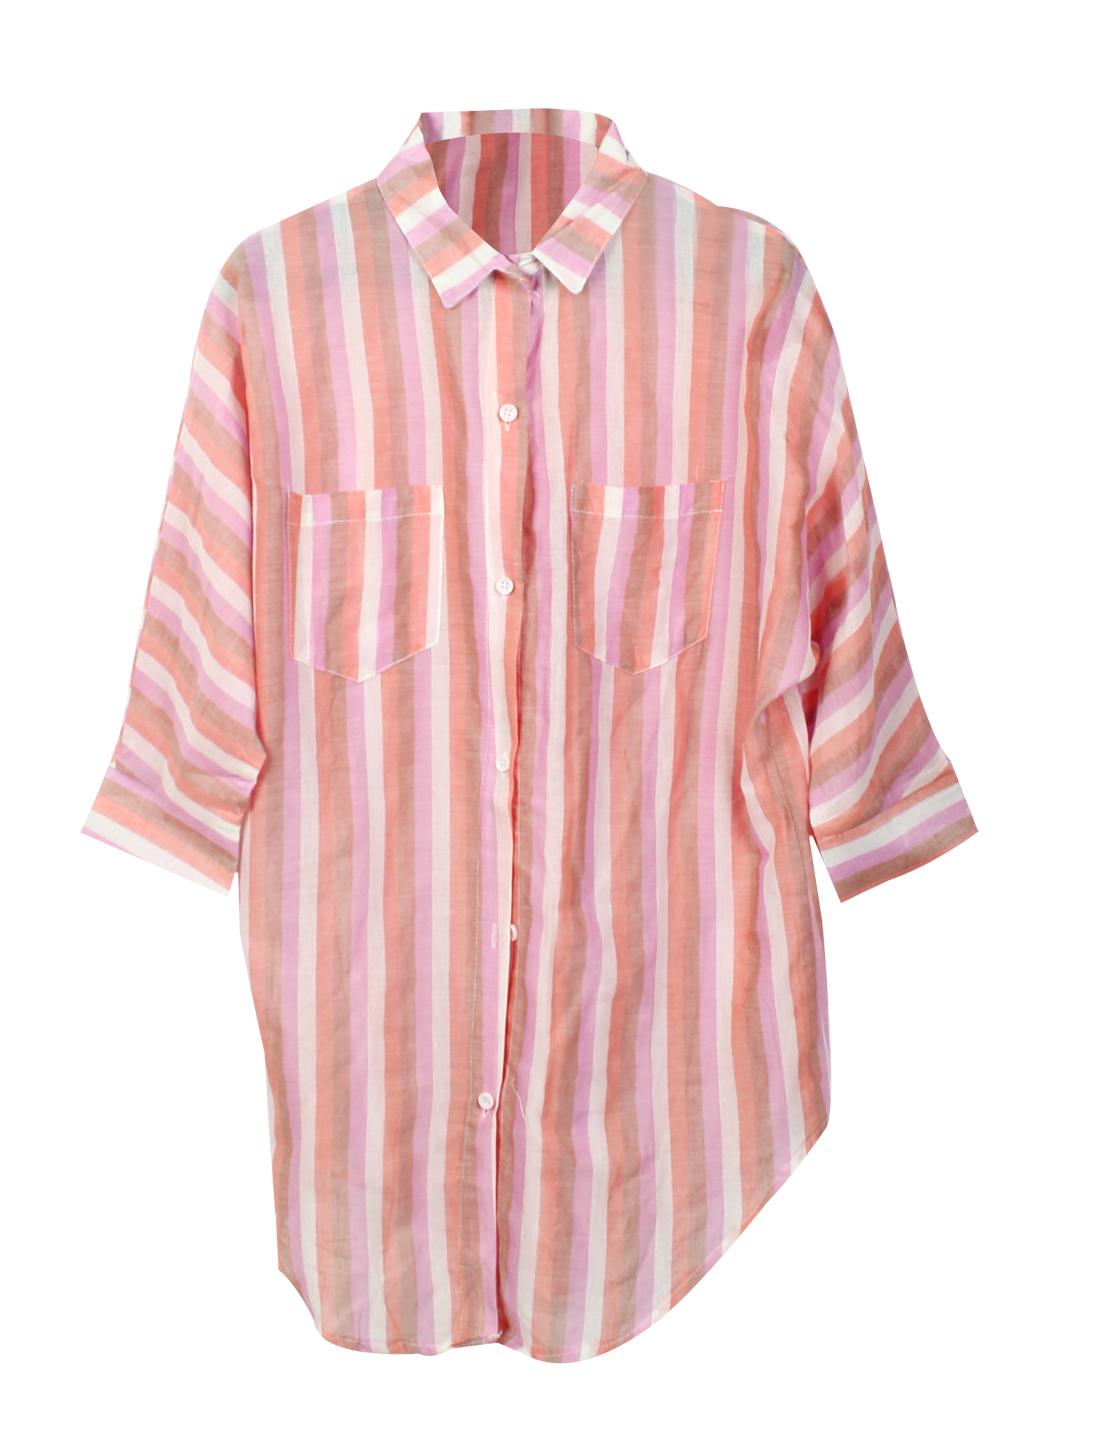 Ladies Point Collar Stripes Pattern Loose Linen Shirt Pink Brown XS